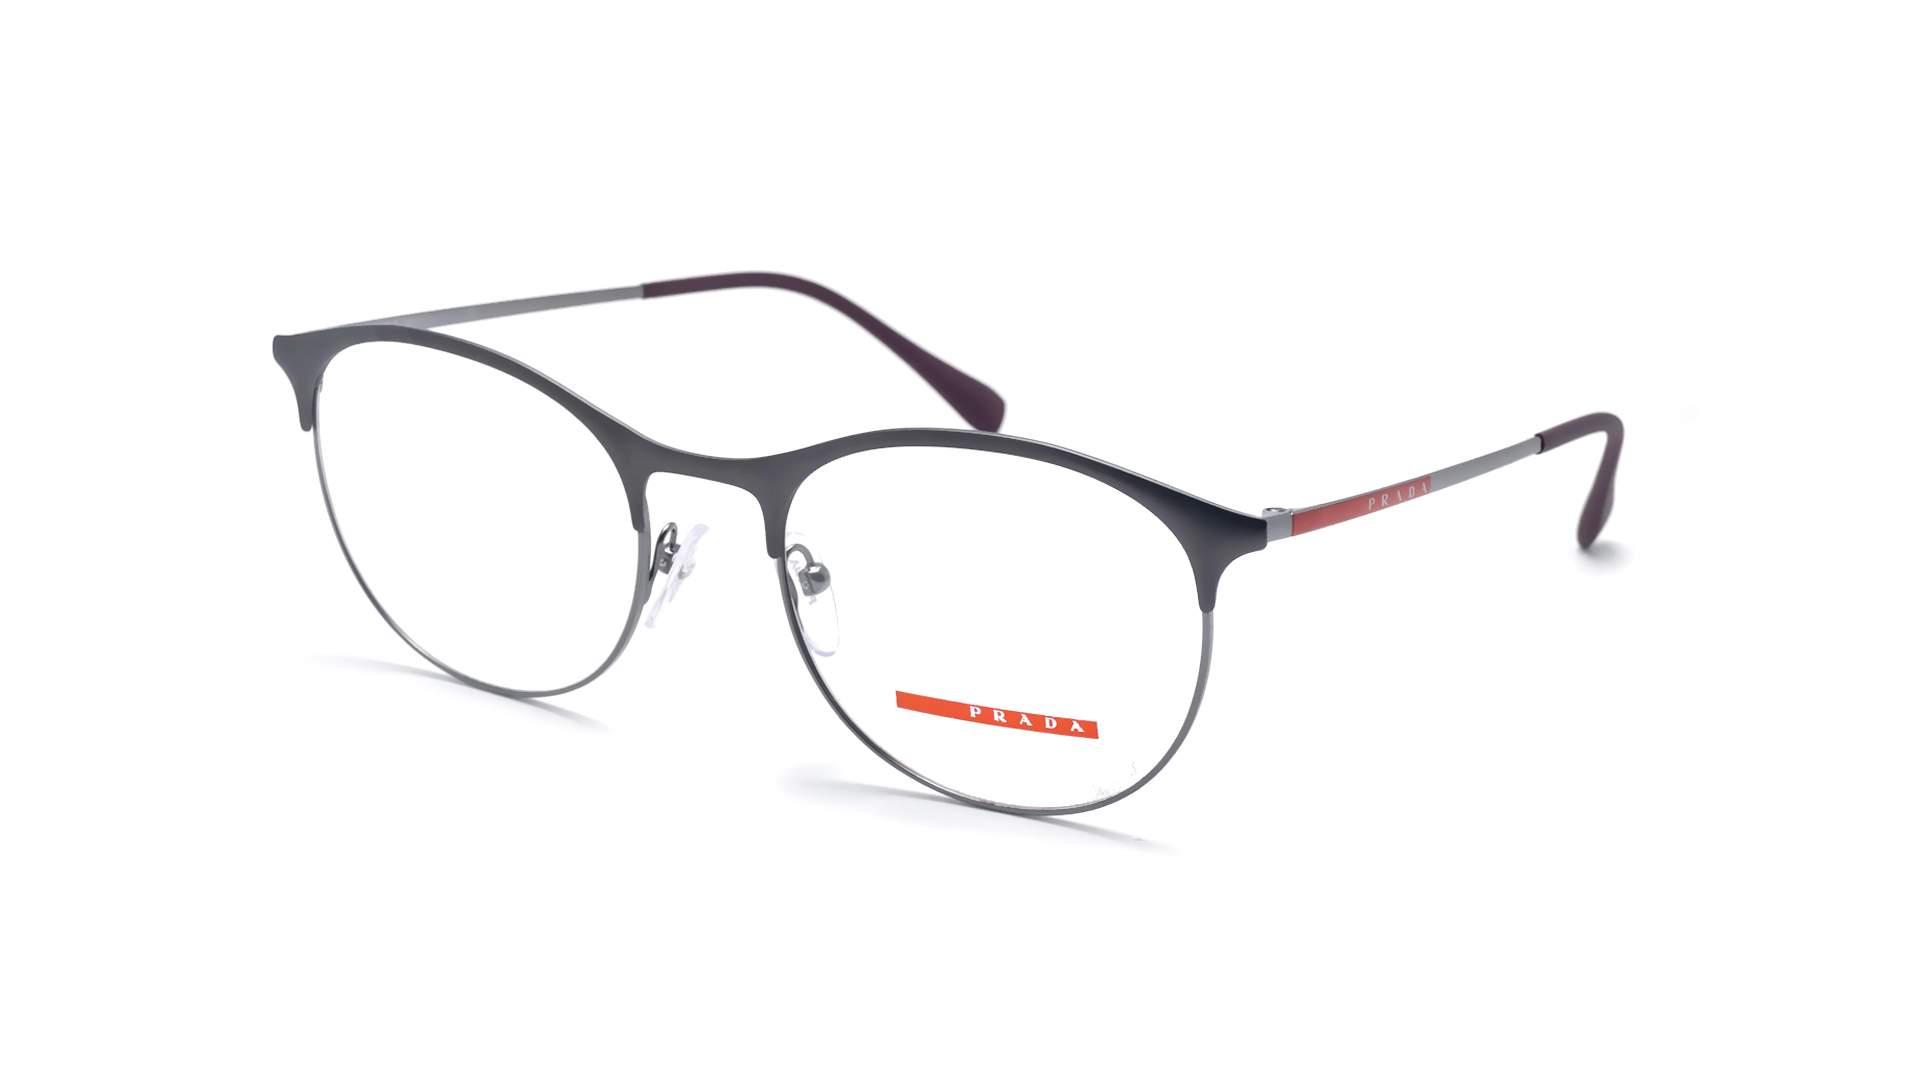 345ab729f89d3 Eyeglasses Prada Linea Rossa PS53IV VIX1O1 52-19 Grey Matte Large